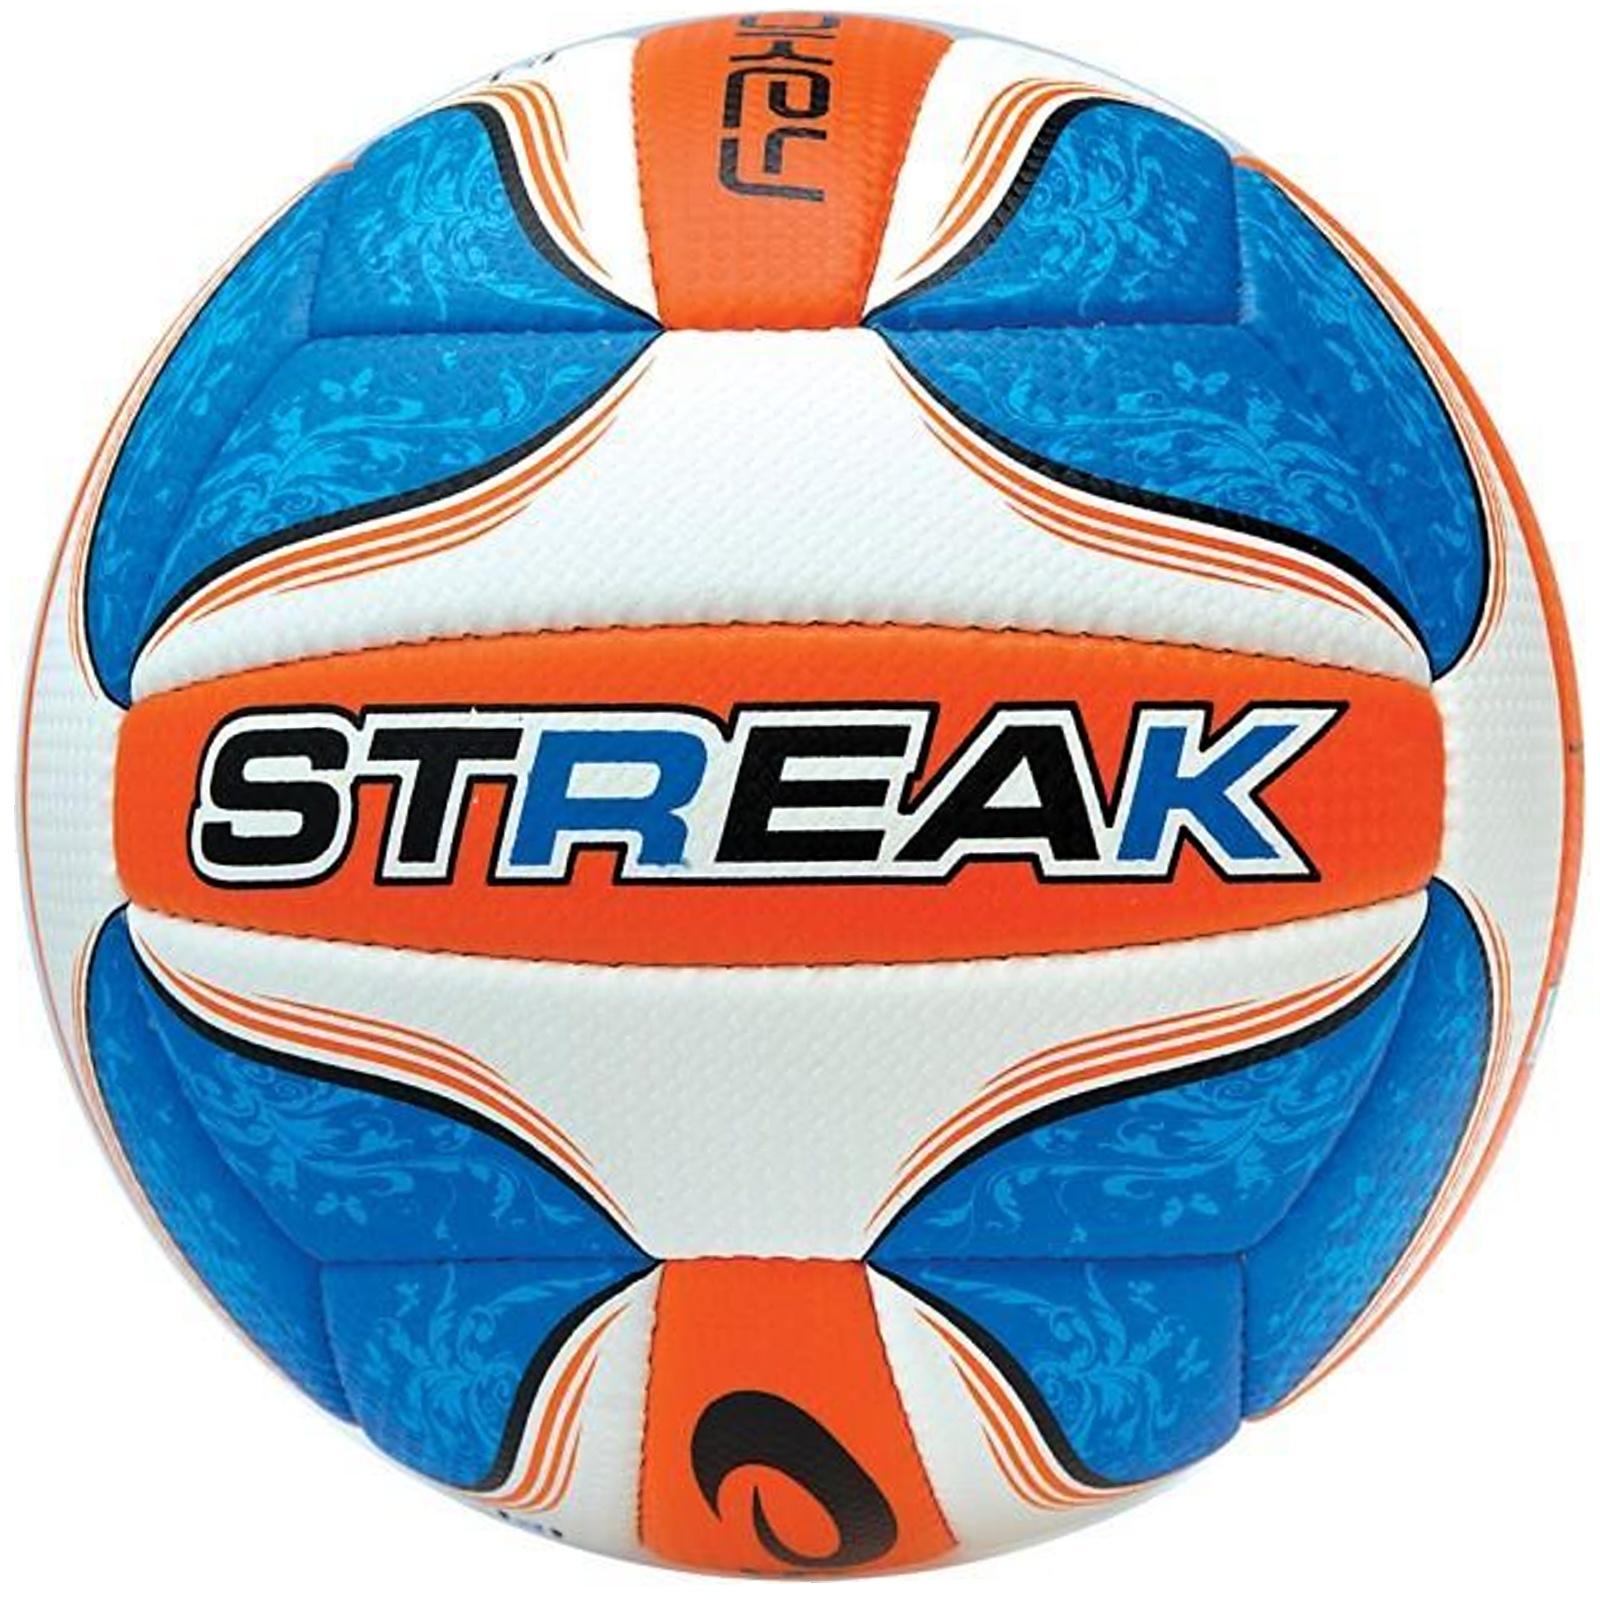 Volejbalový míč SPOKEY Streak II modrý